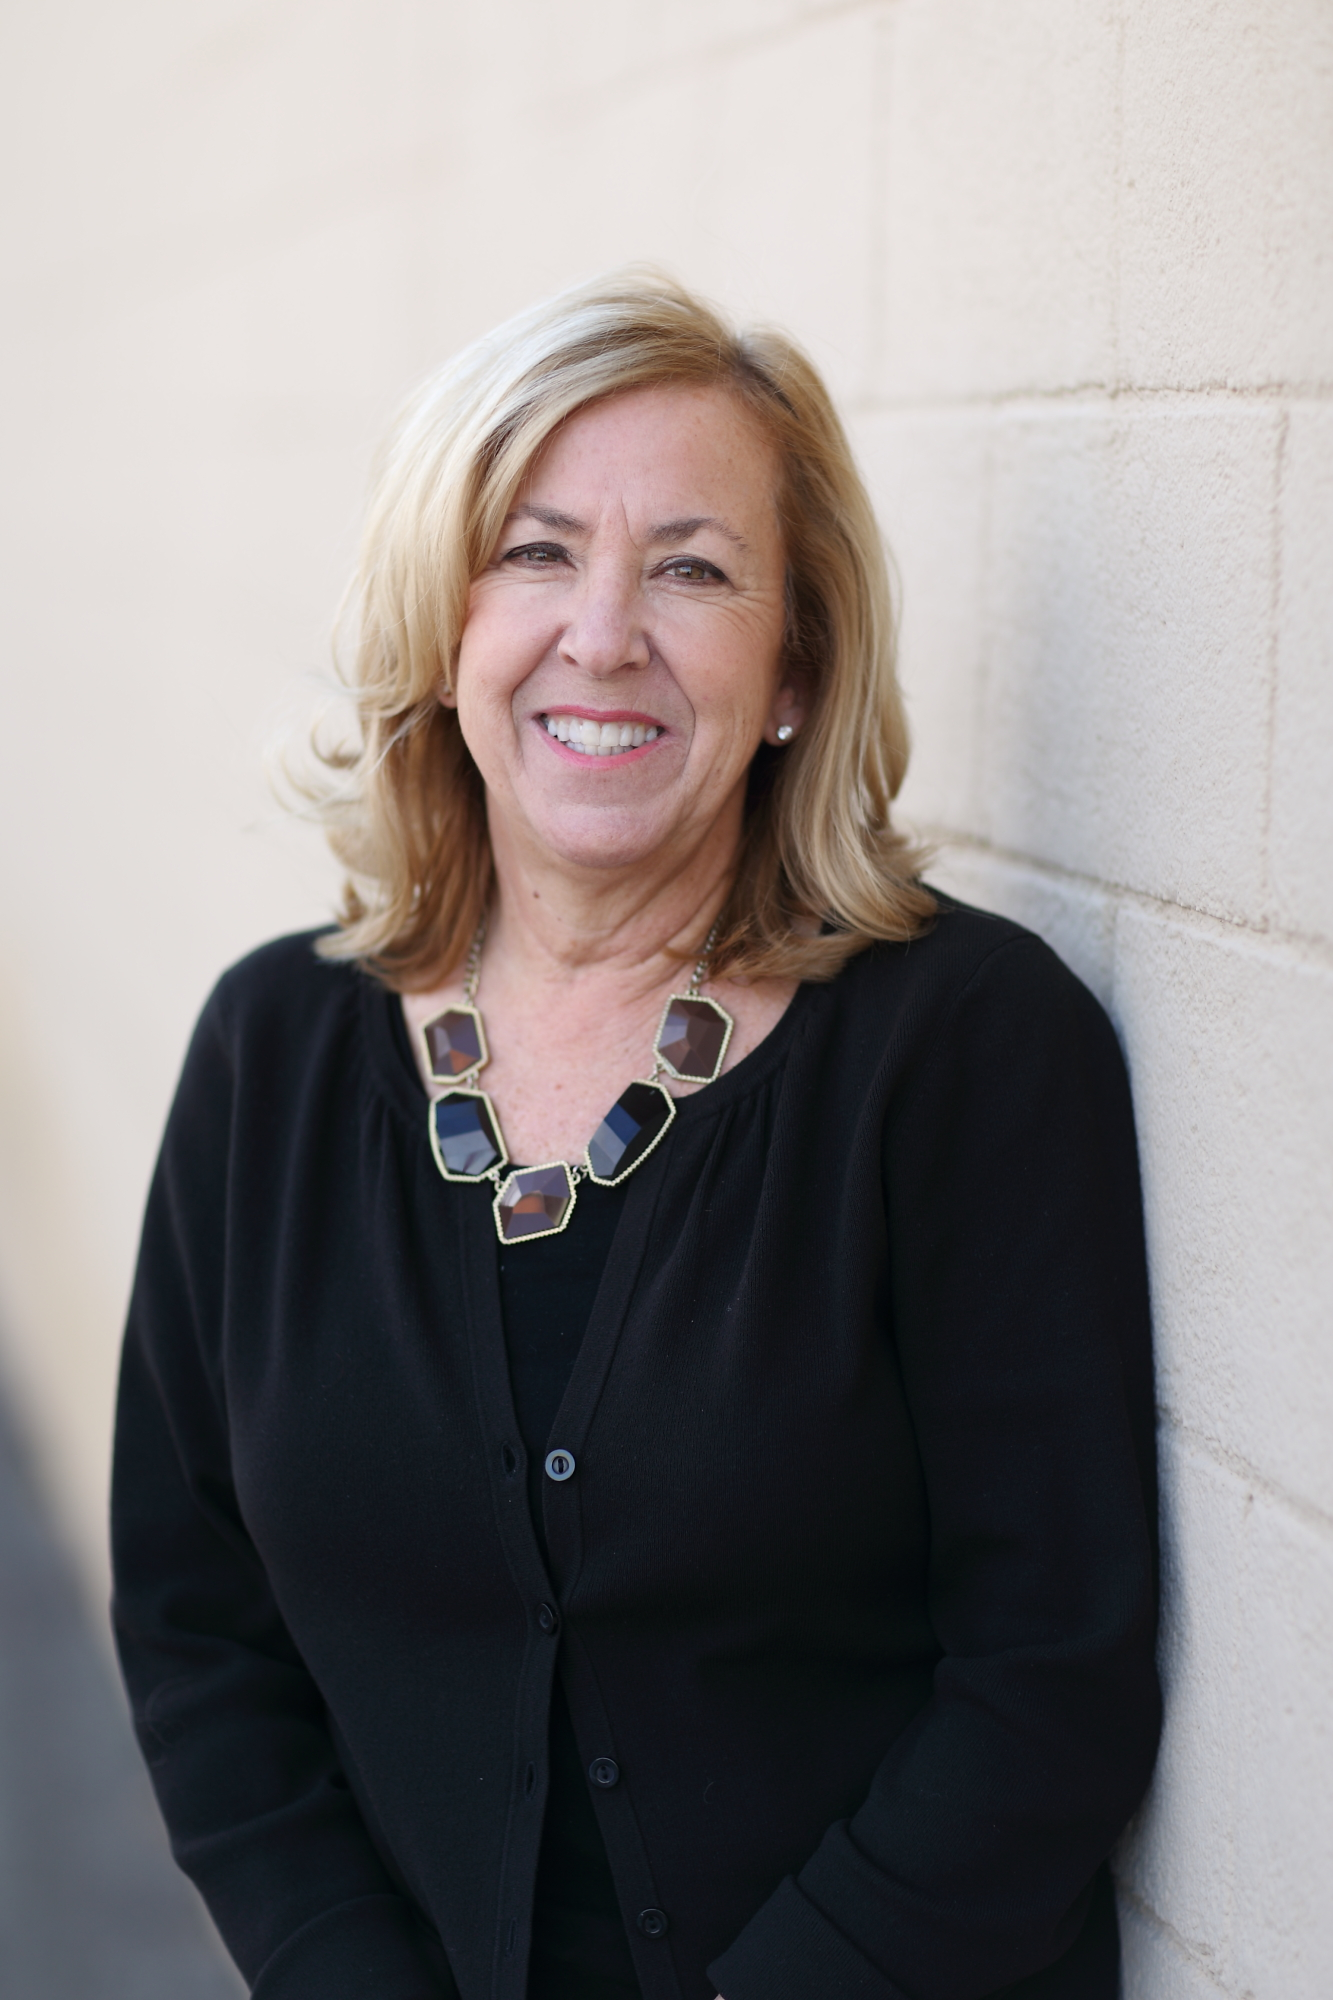 Kathy Poirier